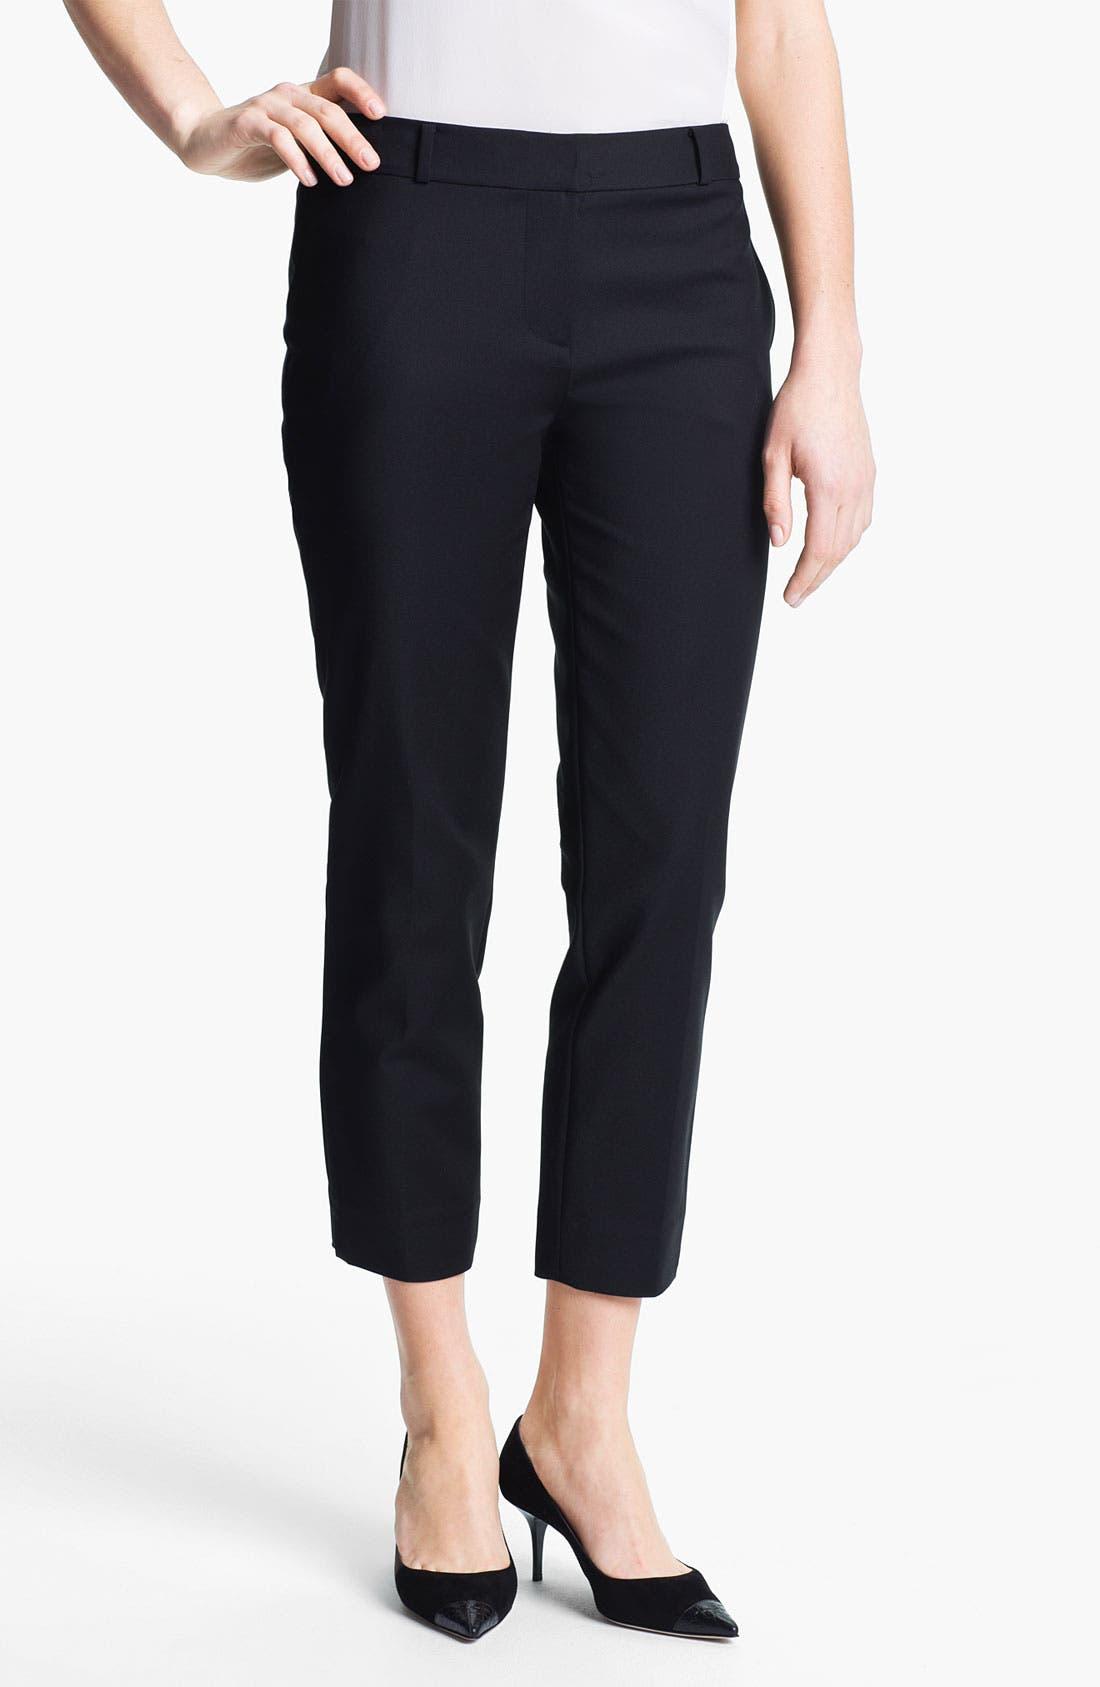 Main Image - kate spade new york 'davis' capri pants